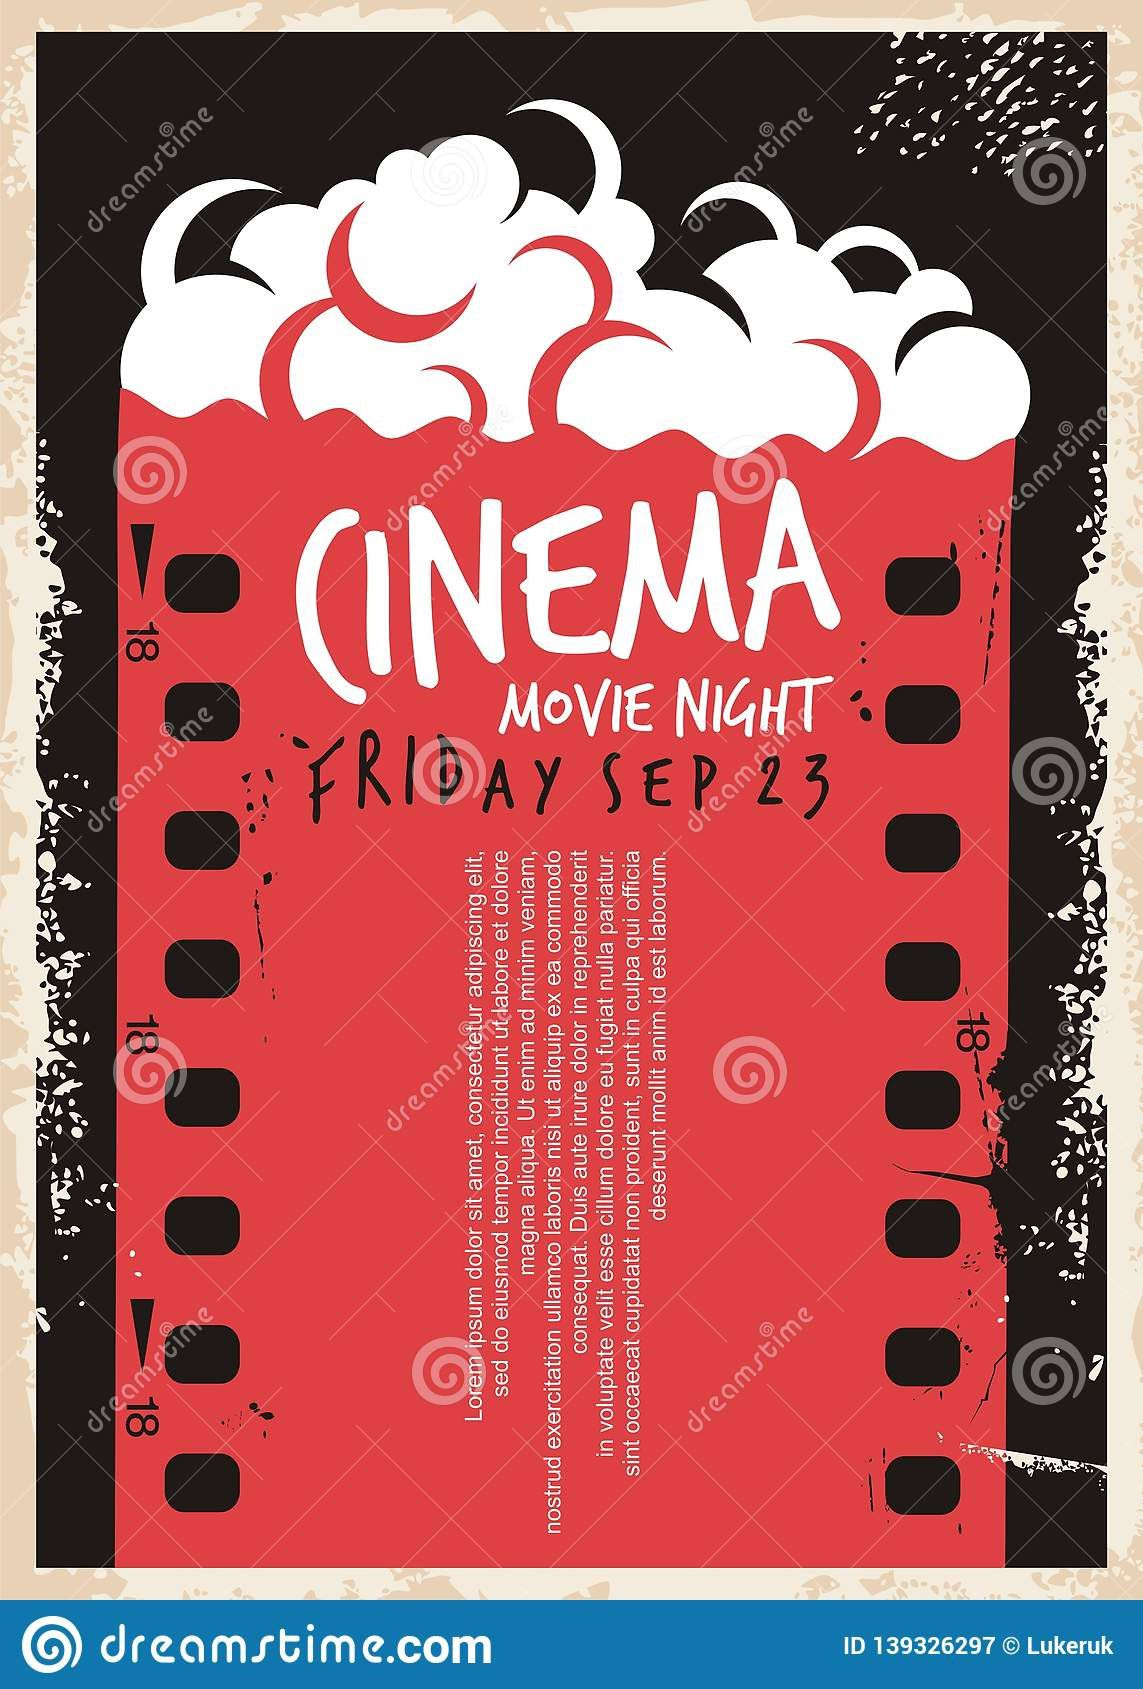 005 Sensational Movie Night Flyer Template Inspiration  Editable Psd FreeFull